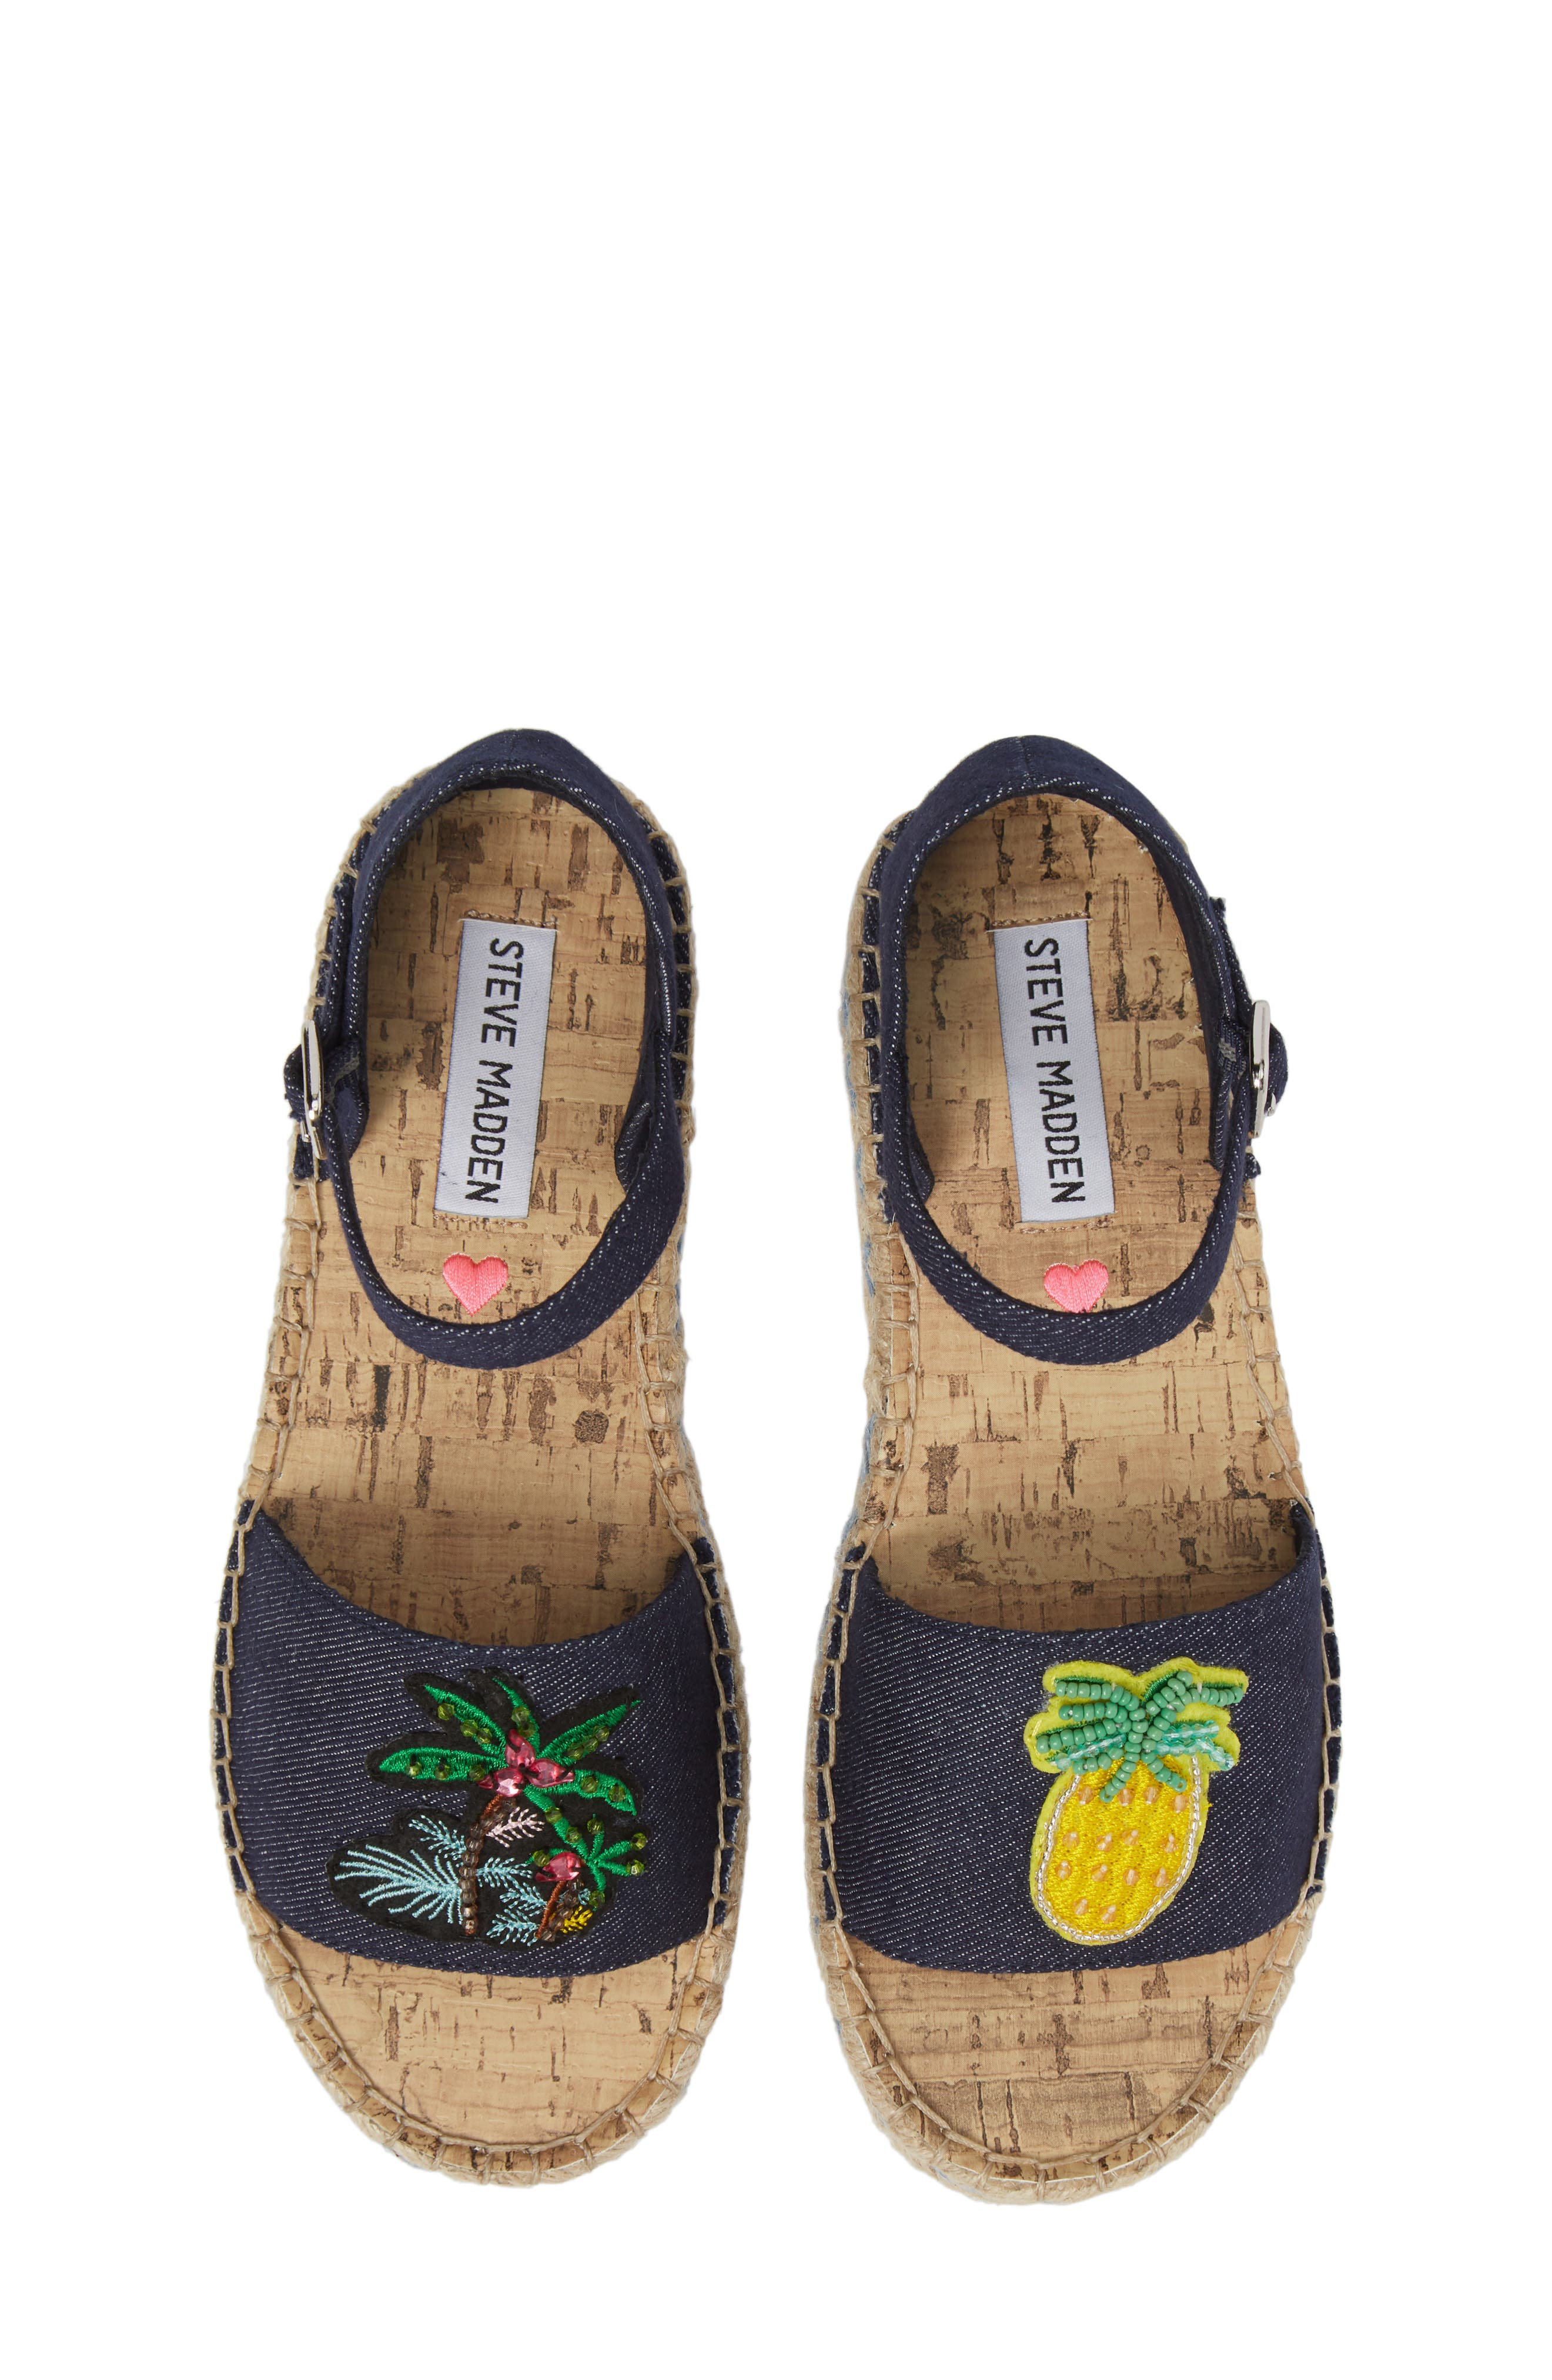 JLUAO Tropical Embellished Sandal,                         Main,                         color, 001